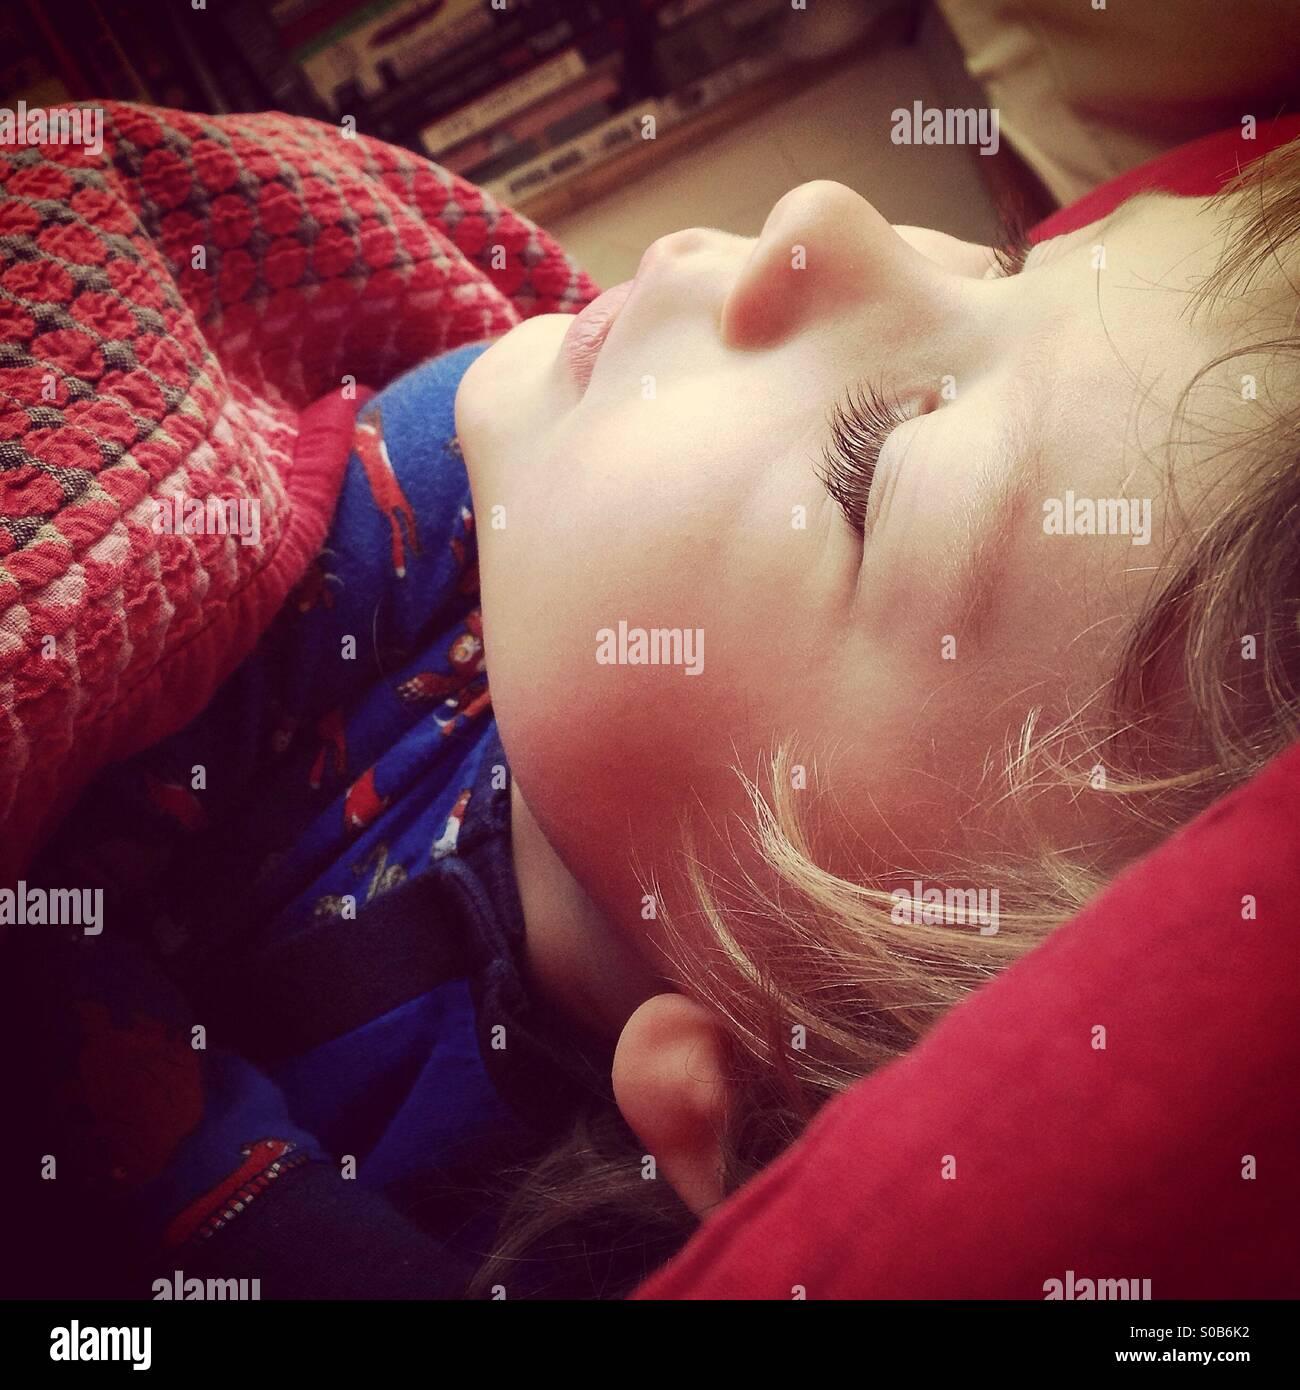 Child sleeping - Stock Image